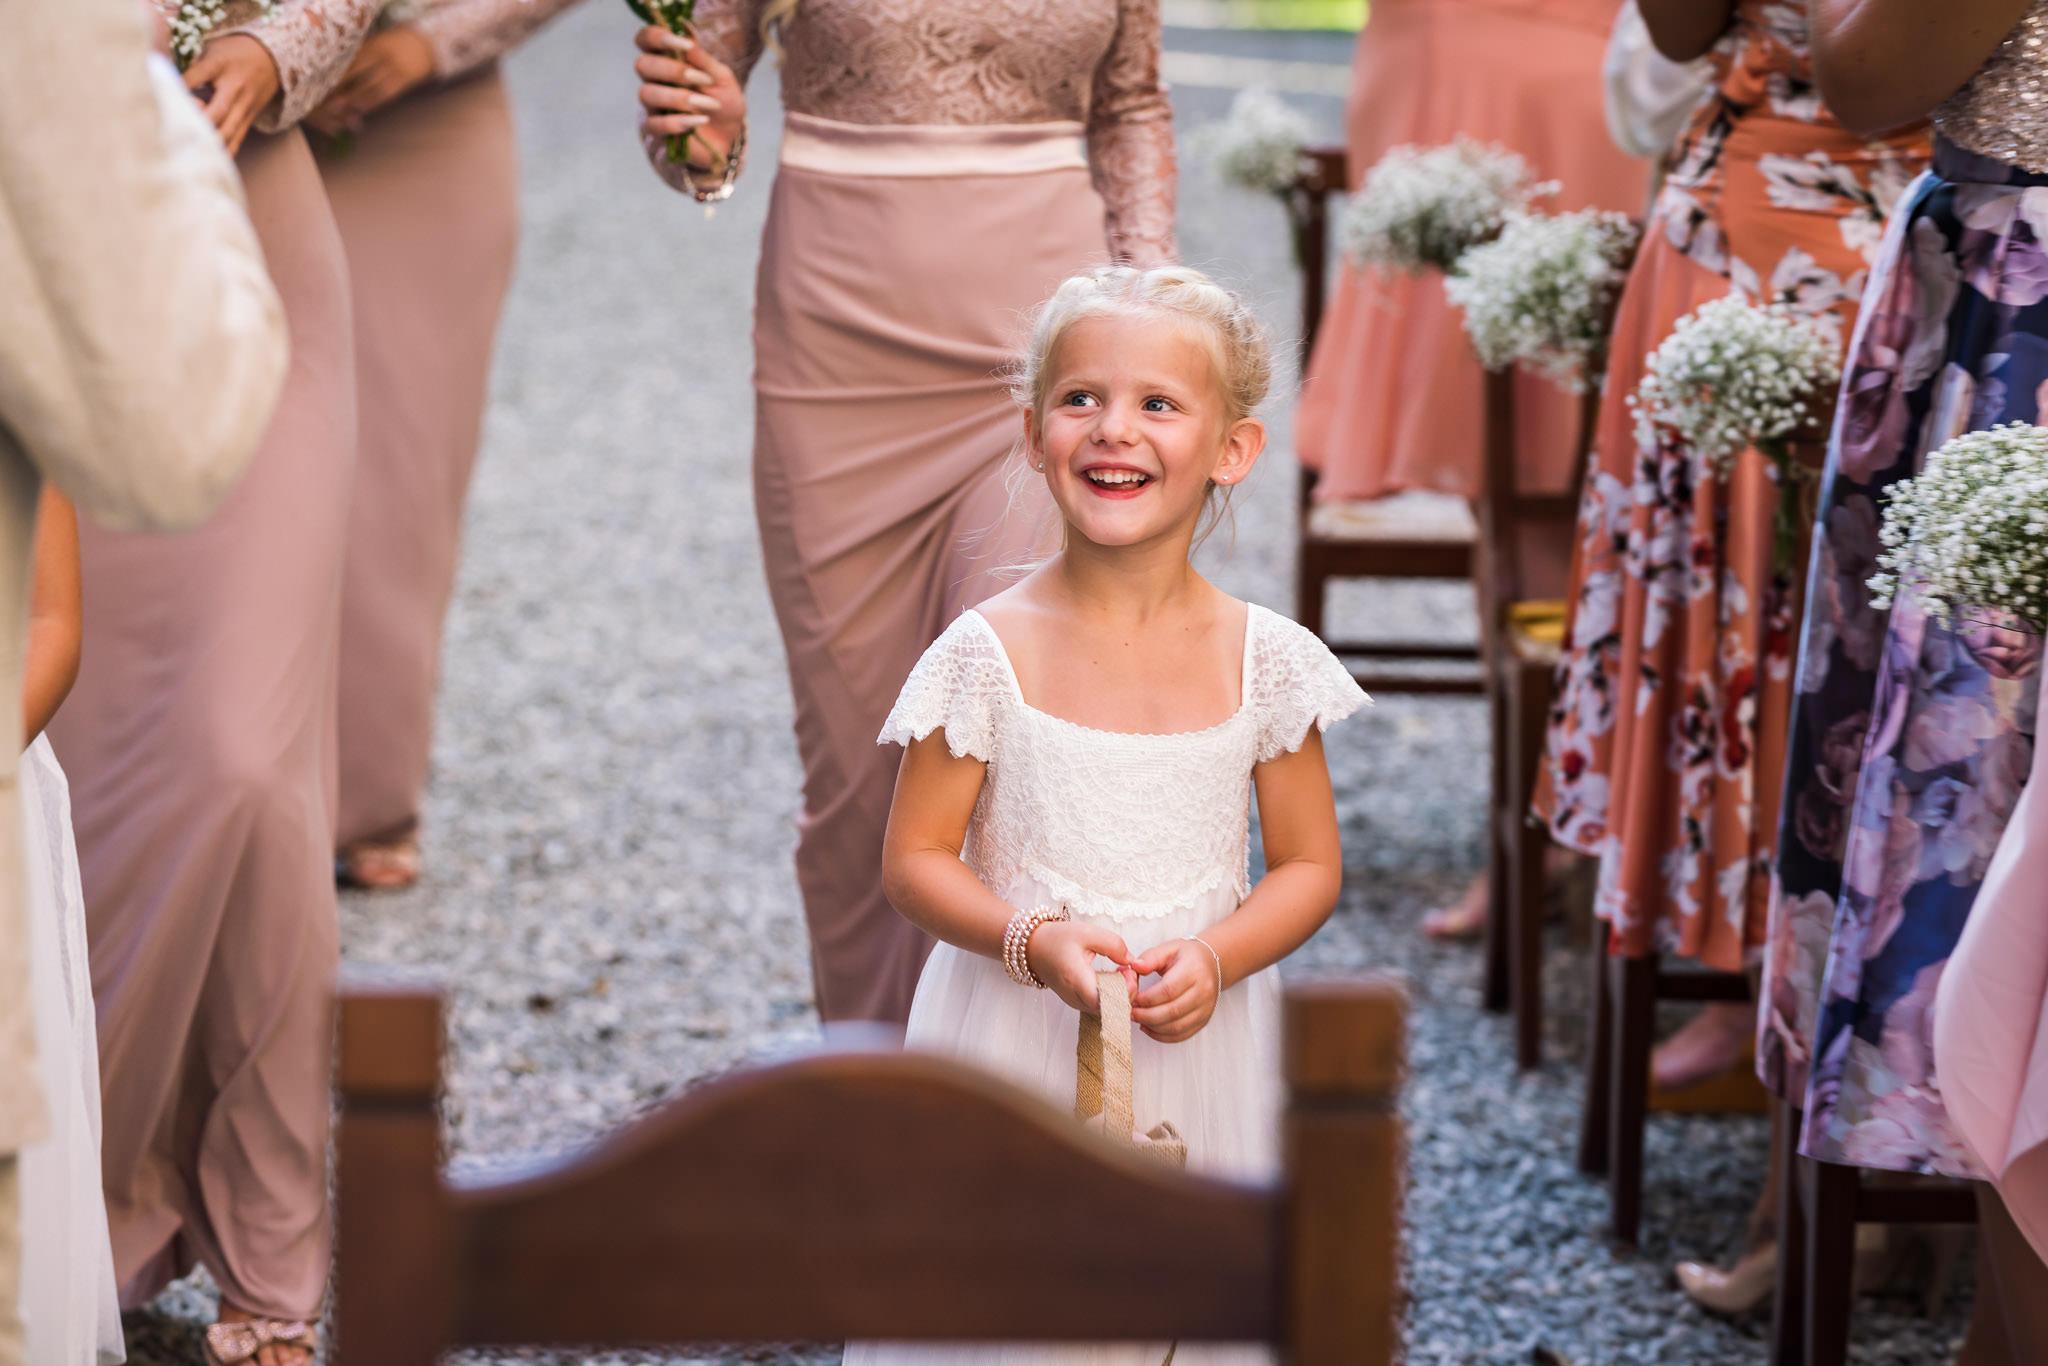 NC-2018-09-07_gemma-and-steve-wedding-1282.jpg